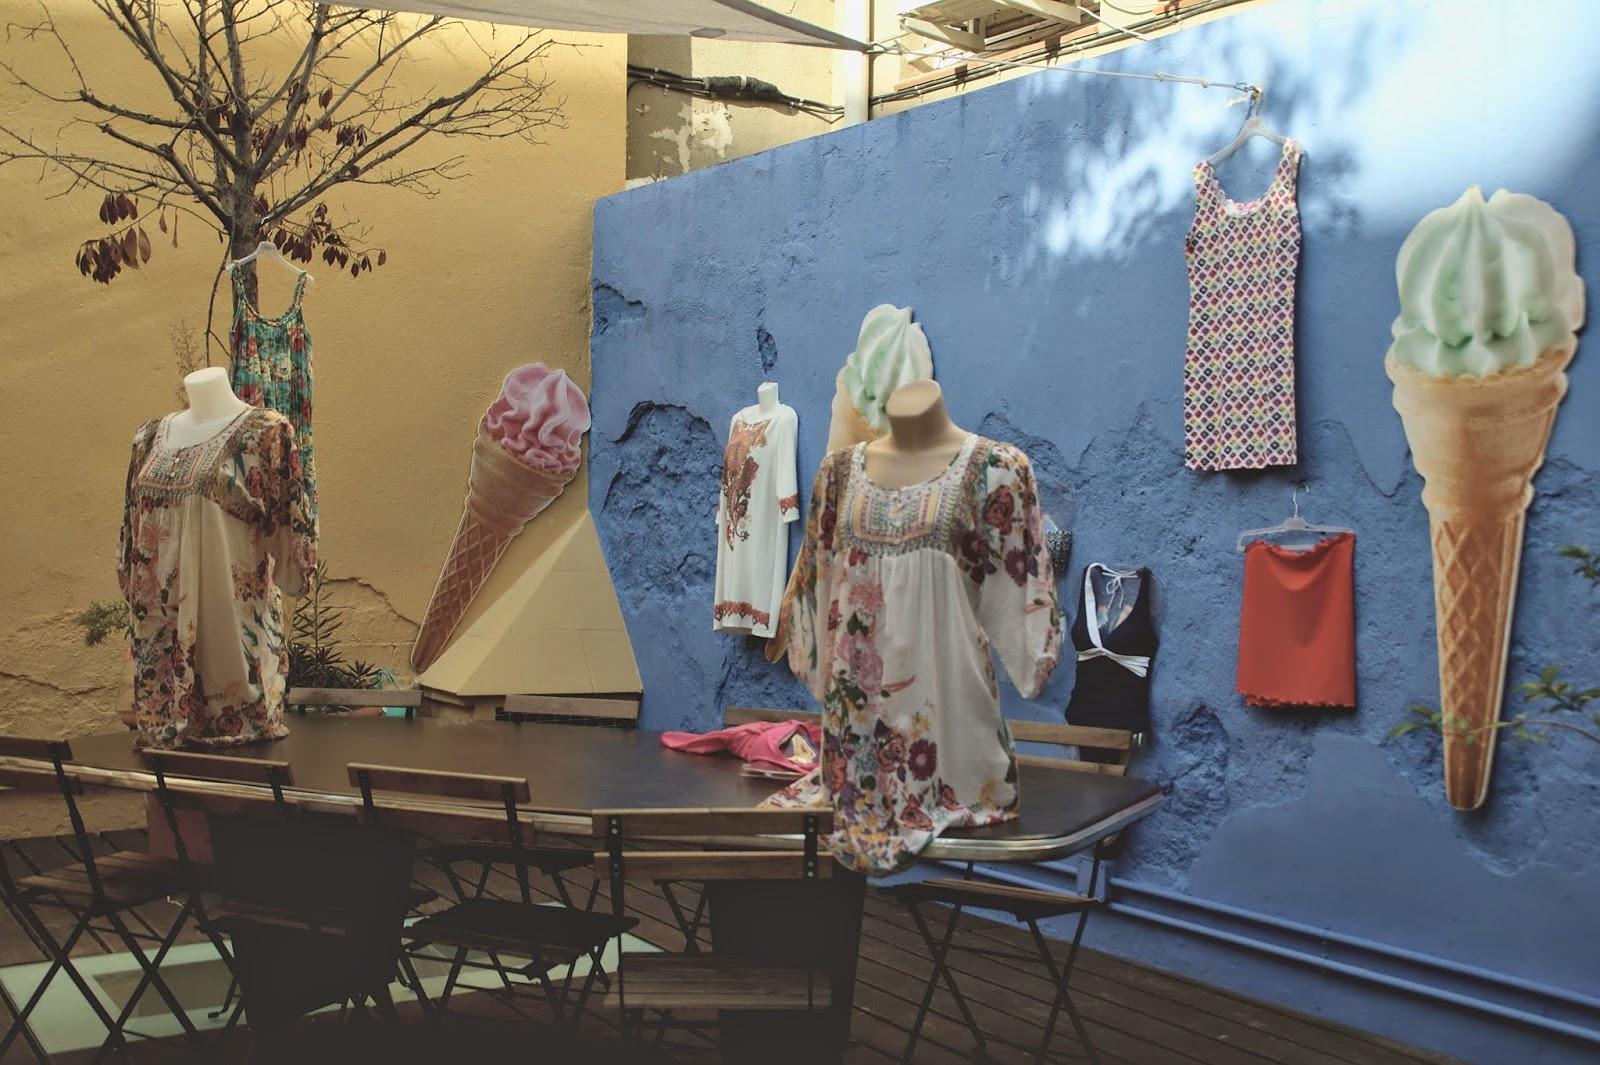 Venca tienda Barclona